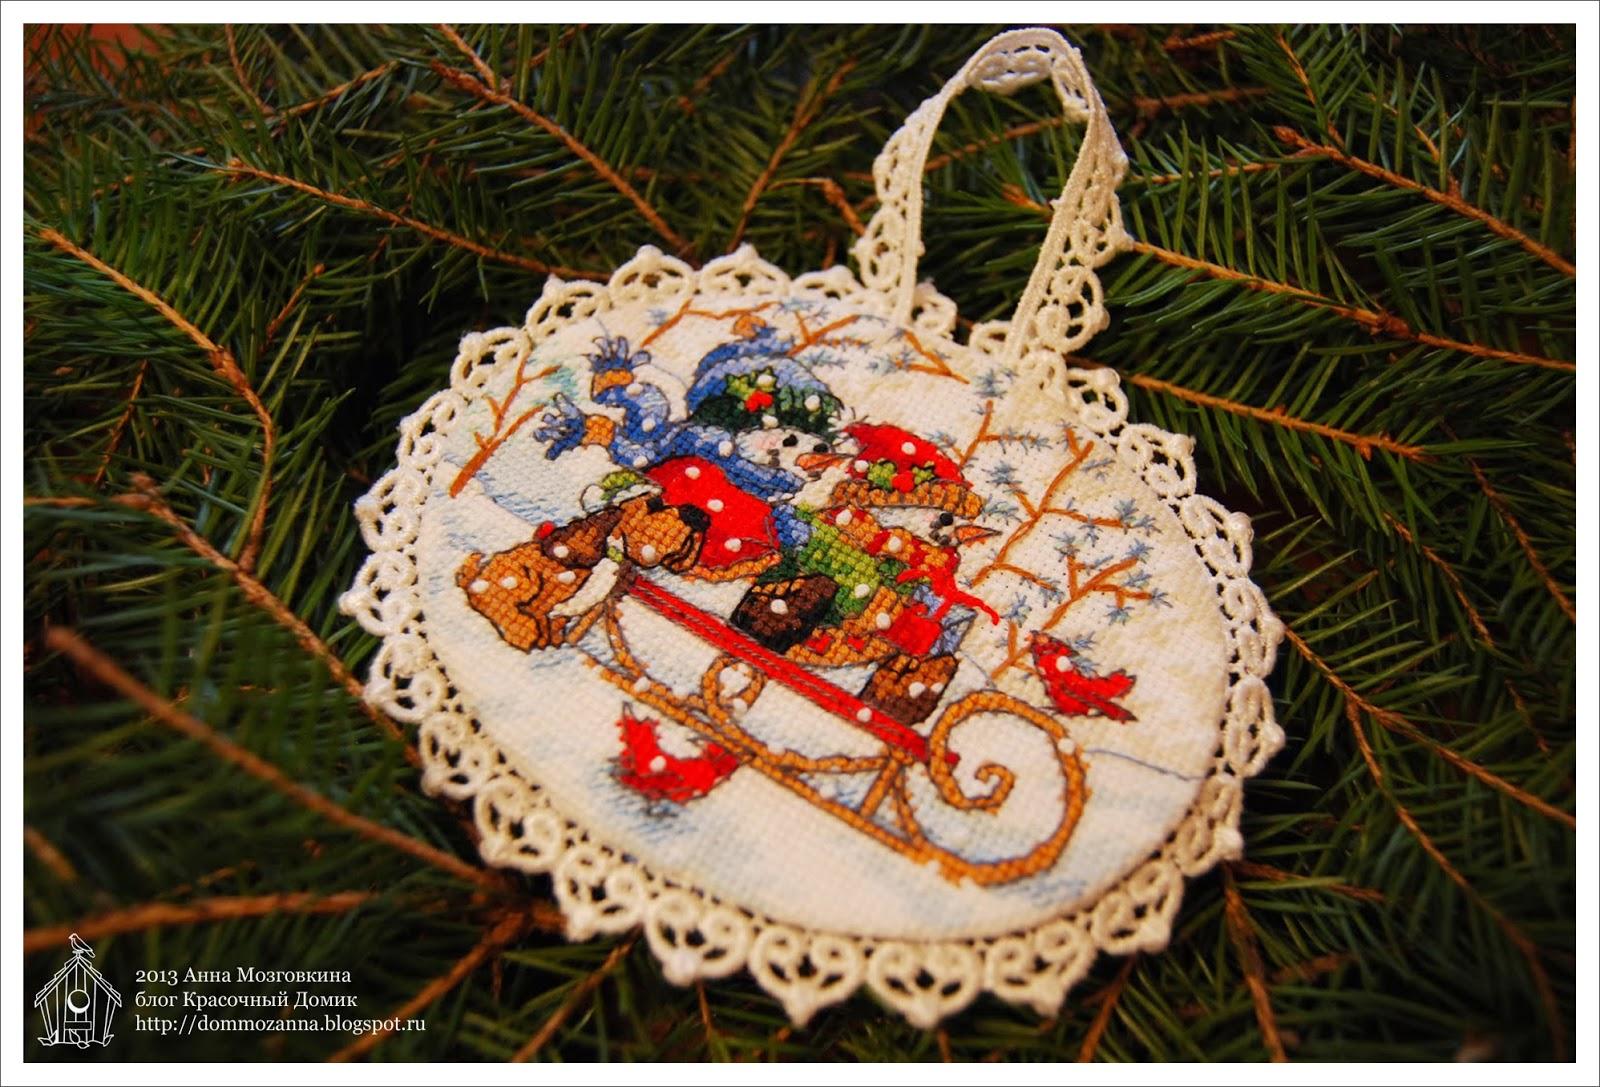 Playful Snowmen Ornaments вышивка крестом